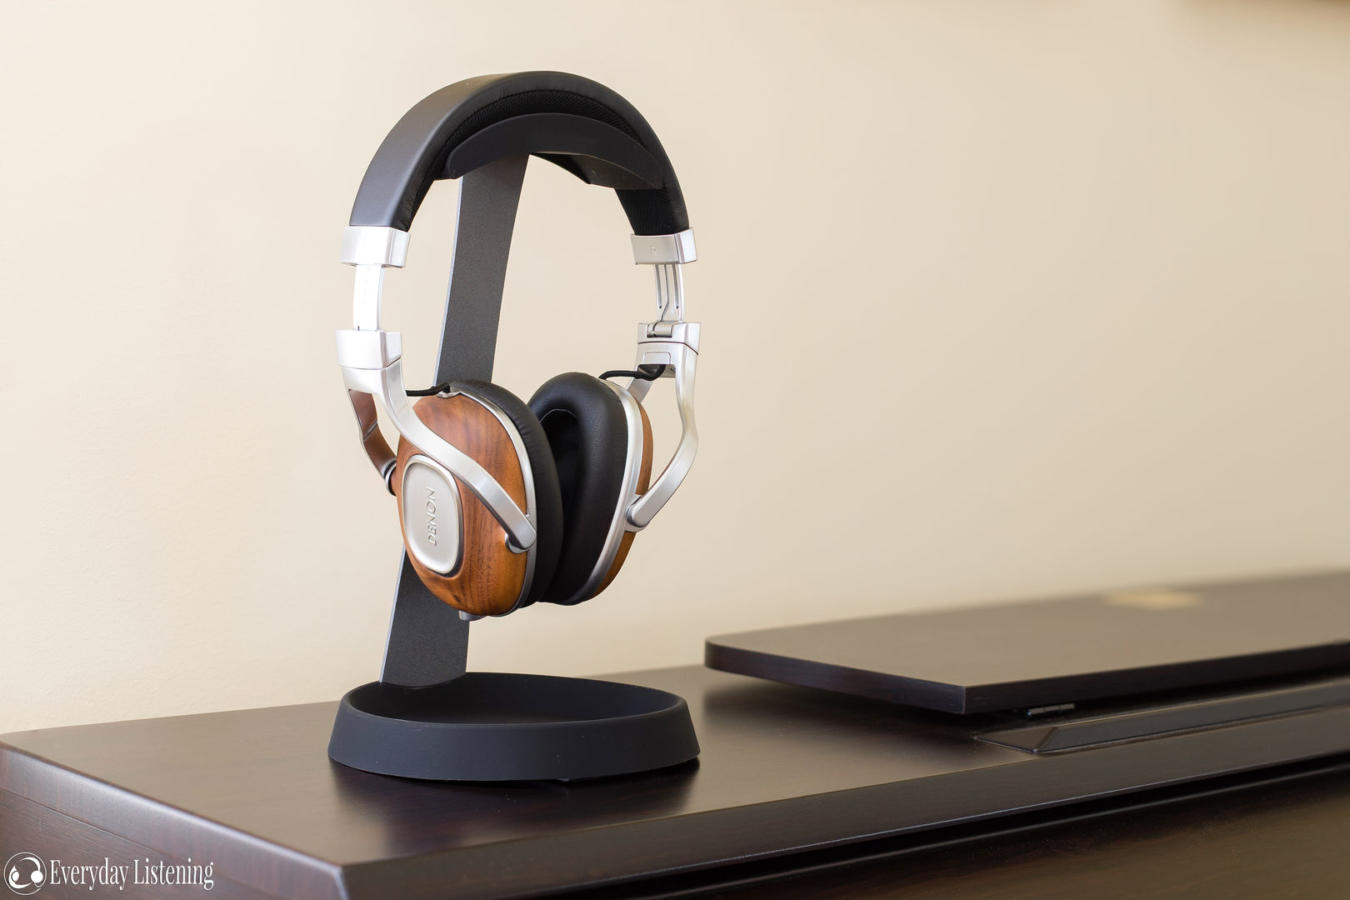 Headphone Stand Designs : Avantree hs headphone stand review the headphone list